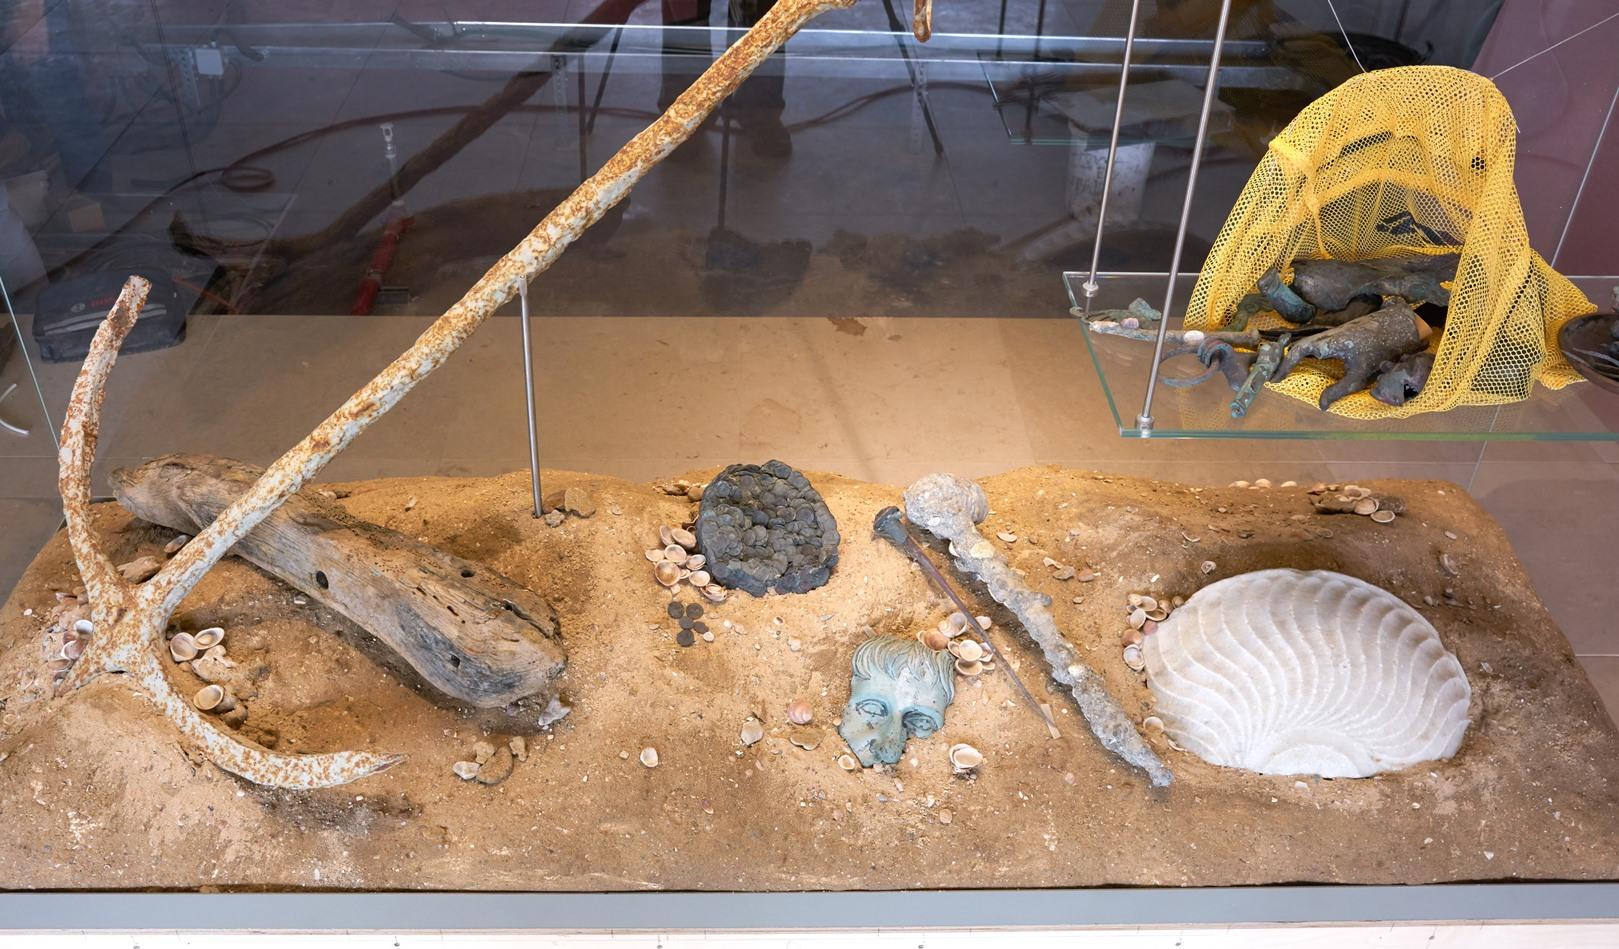 Exhibit of ancient objects found off the coast of Caesarea. Photo by Ardon Bar-Hama